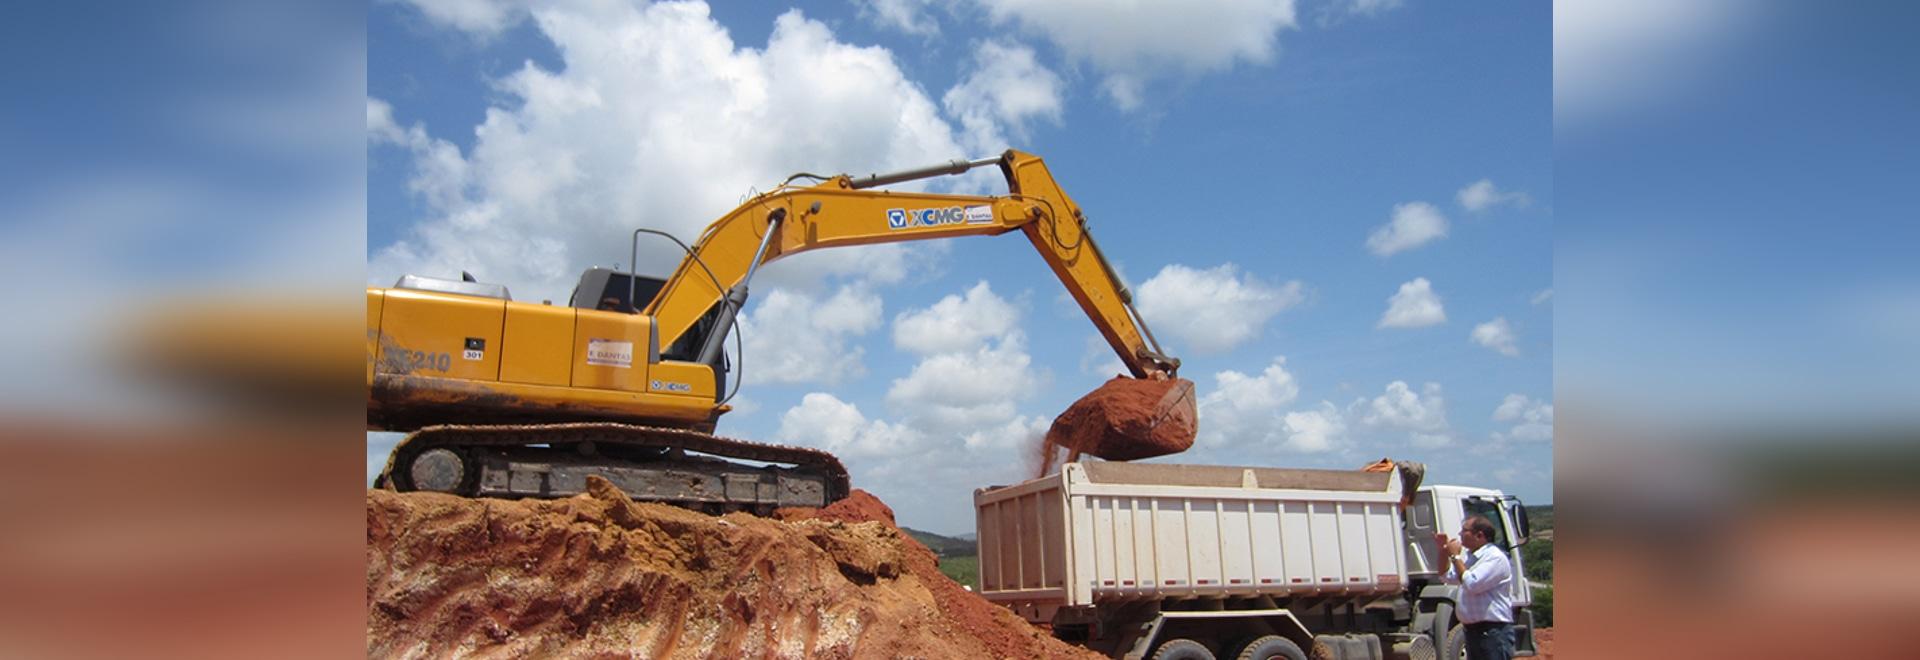 XE210 Brazil quarry construction